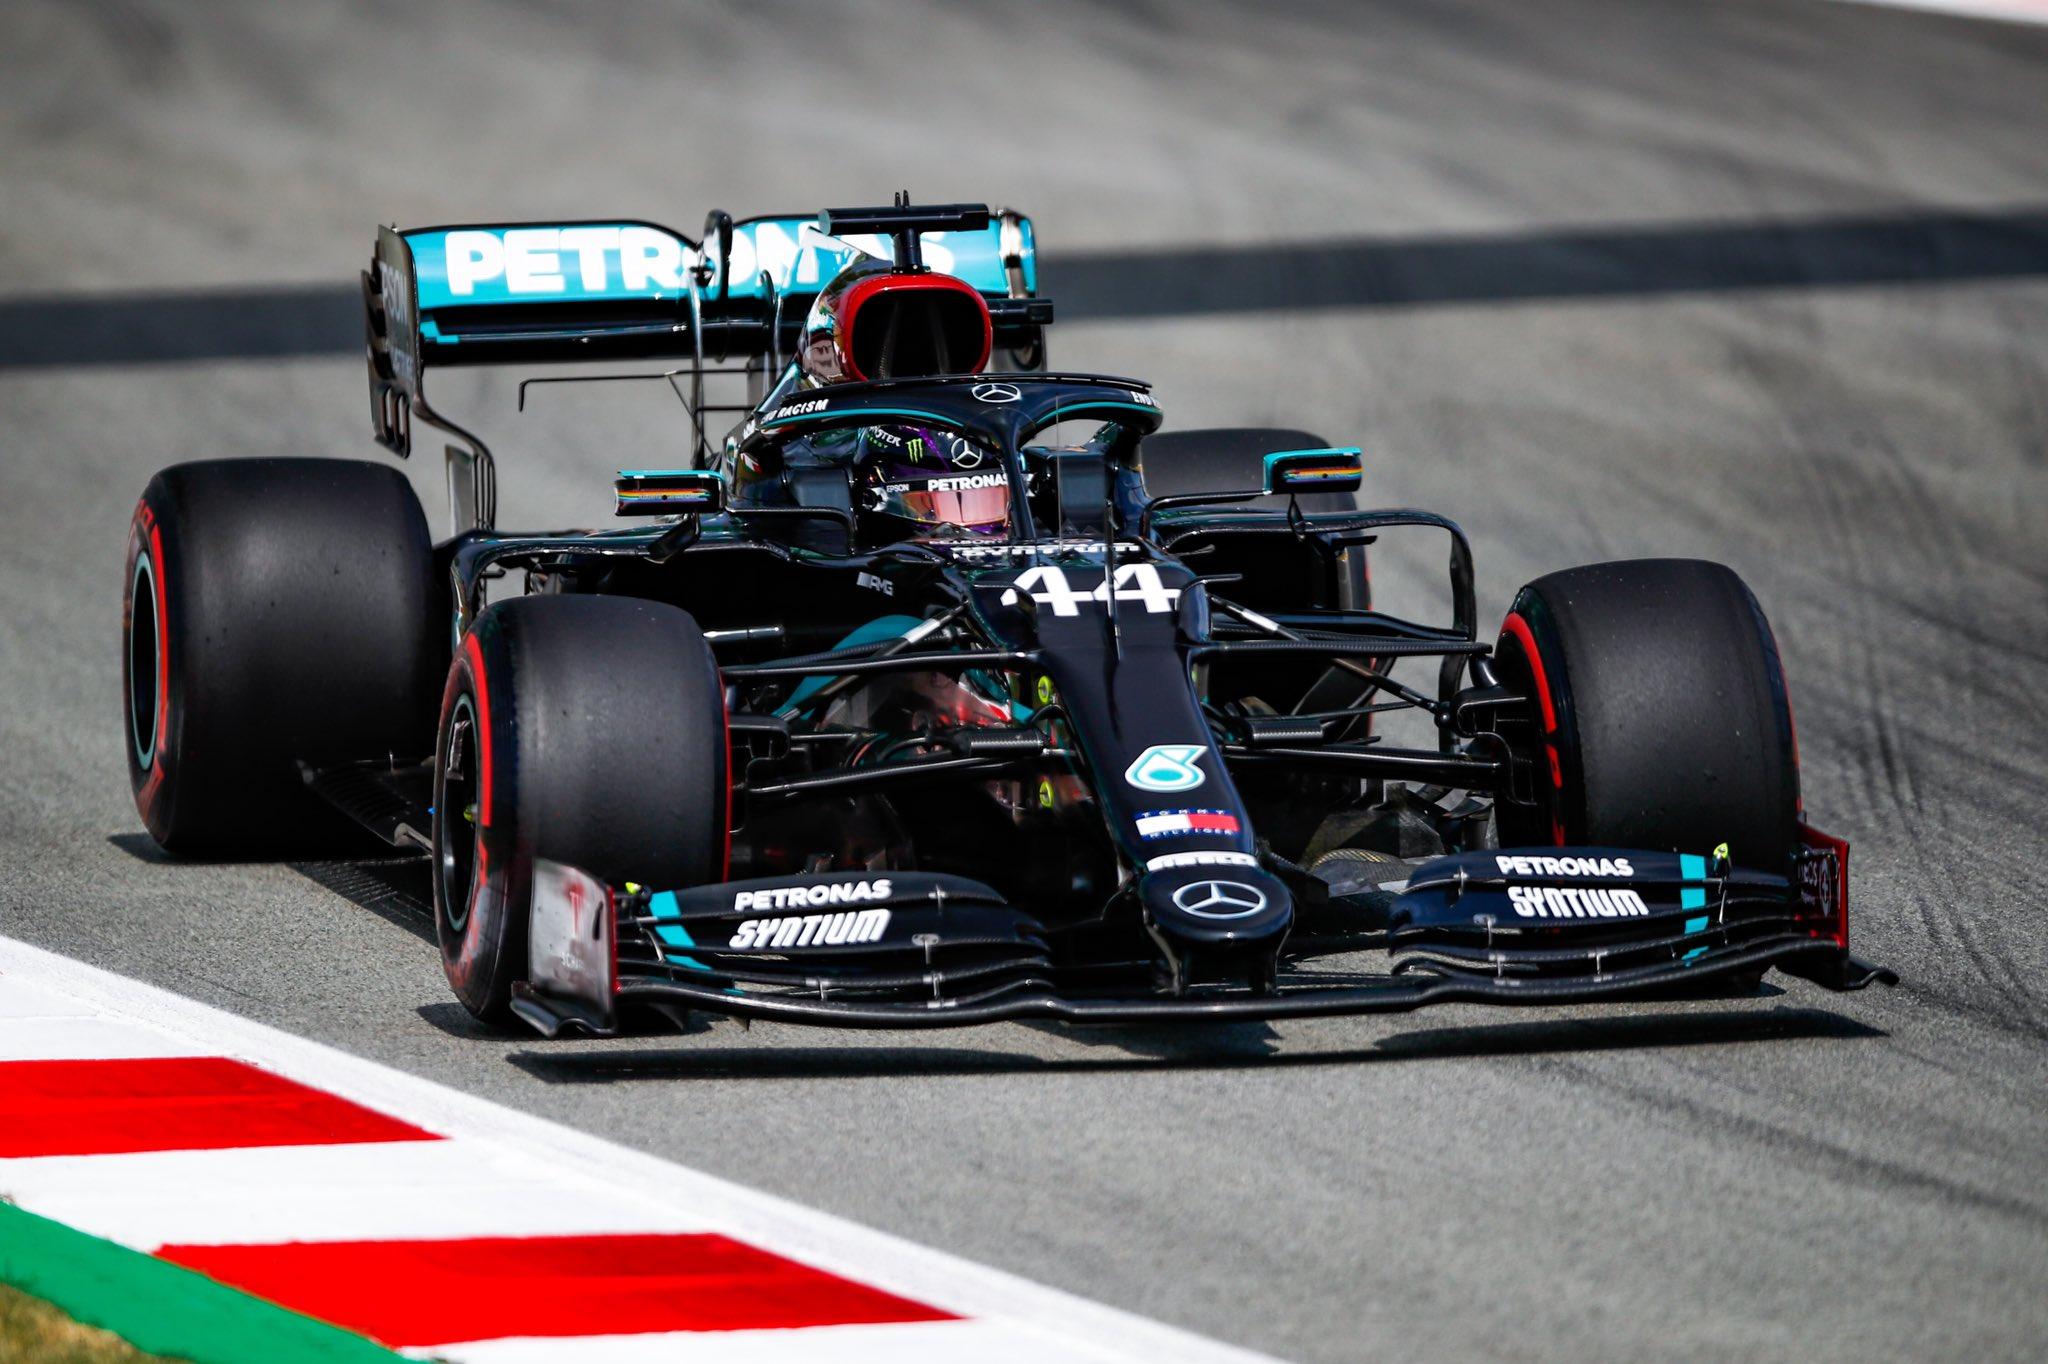 GP d'Espagne - EL2 : Hamilton deux dixièmes devant Bottas 1